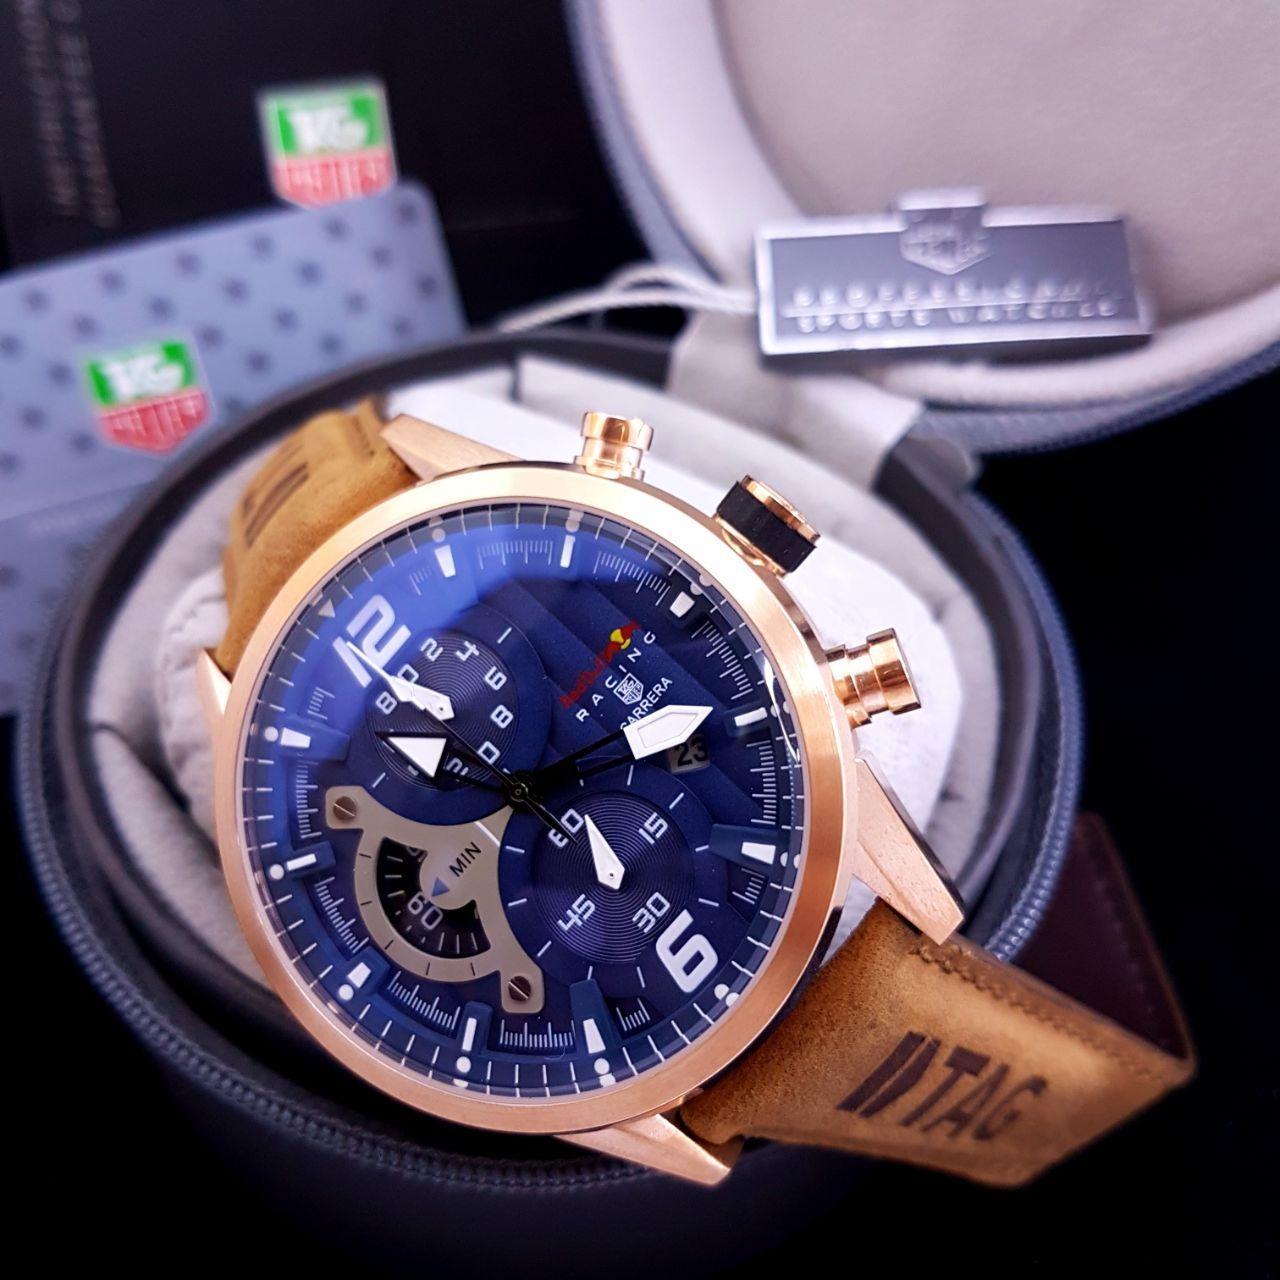 Jam Tangan Pria TAGHeuer_Carrera Redbull Racing Blue-Brown Leather